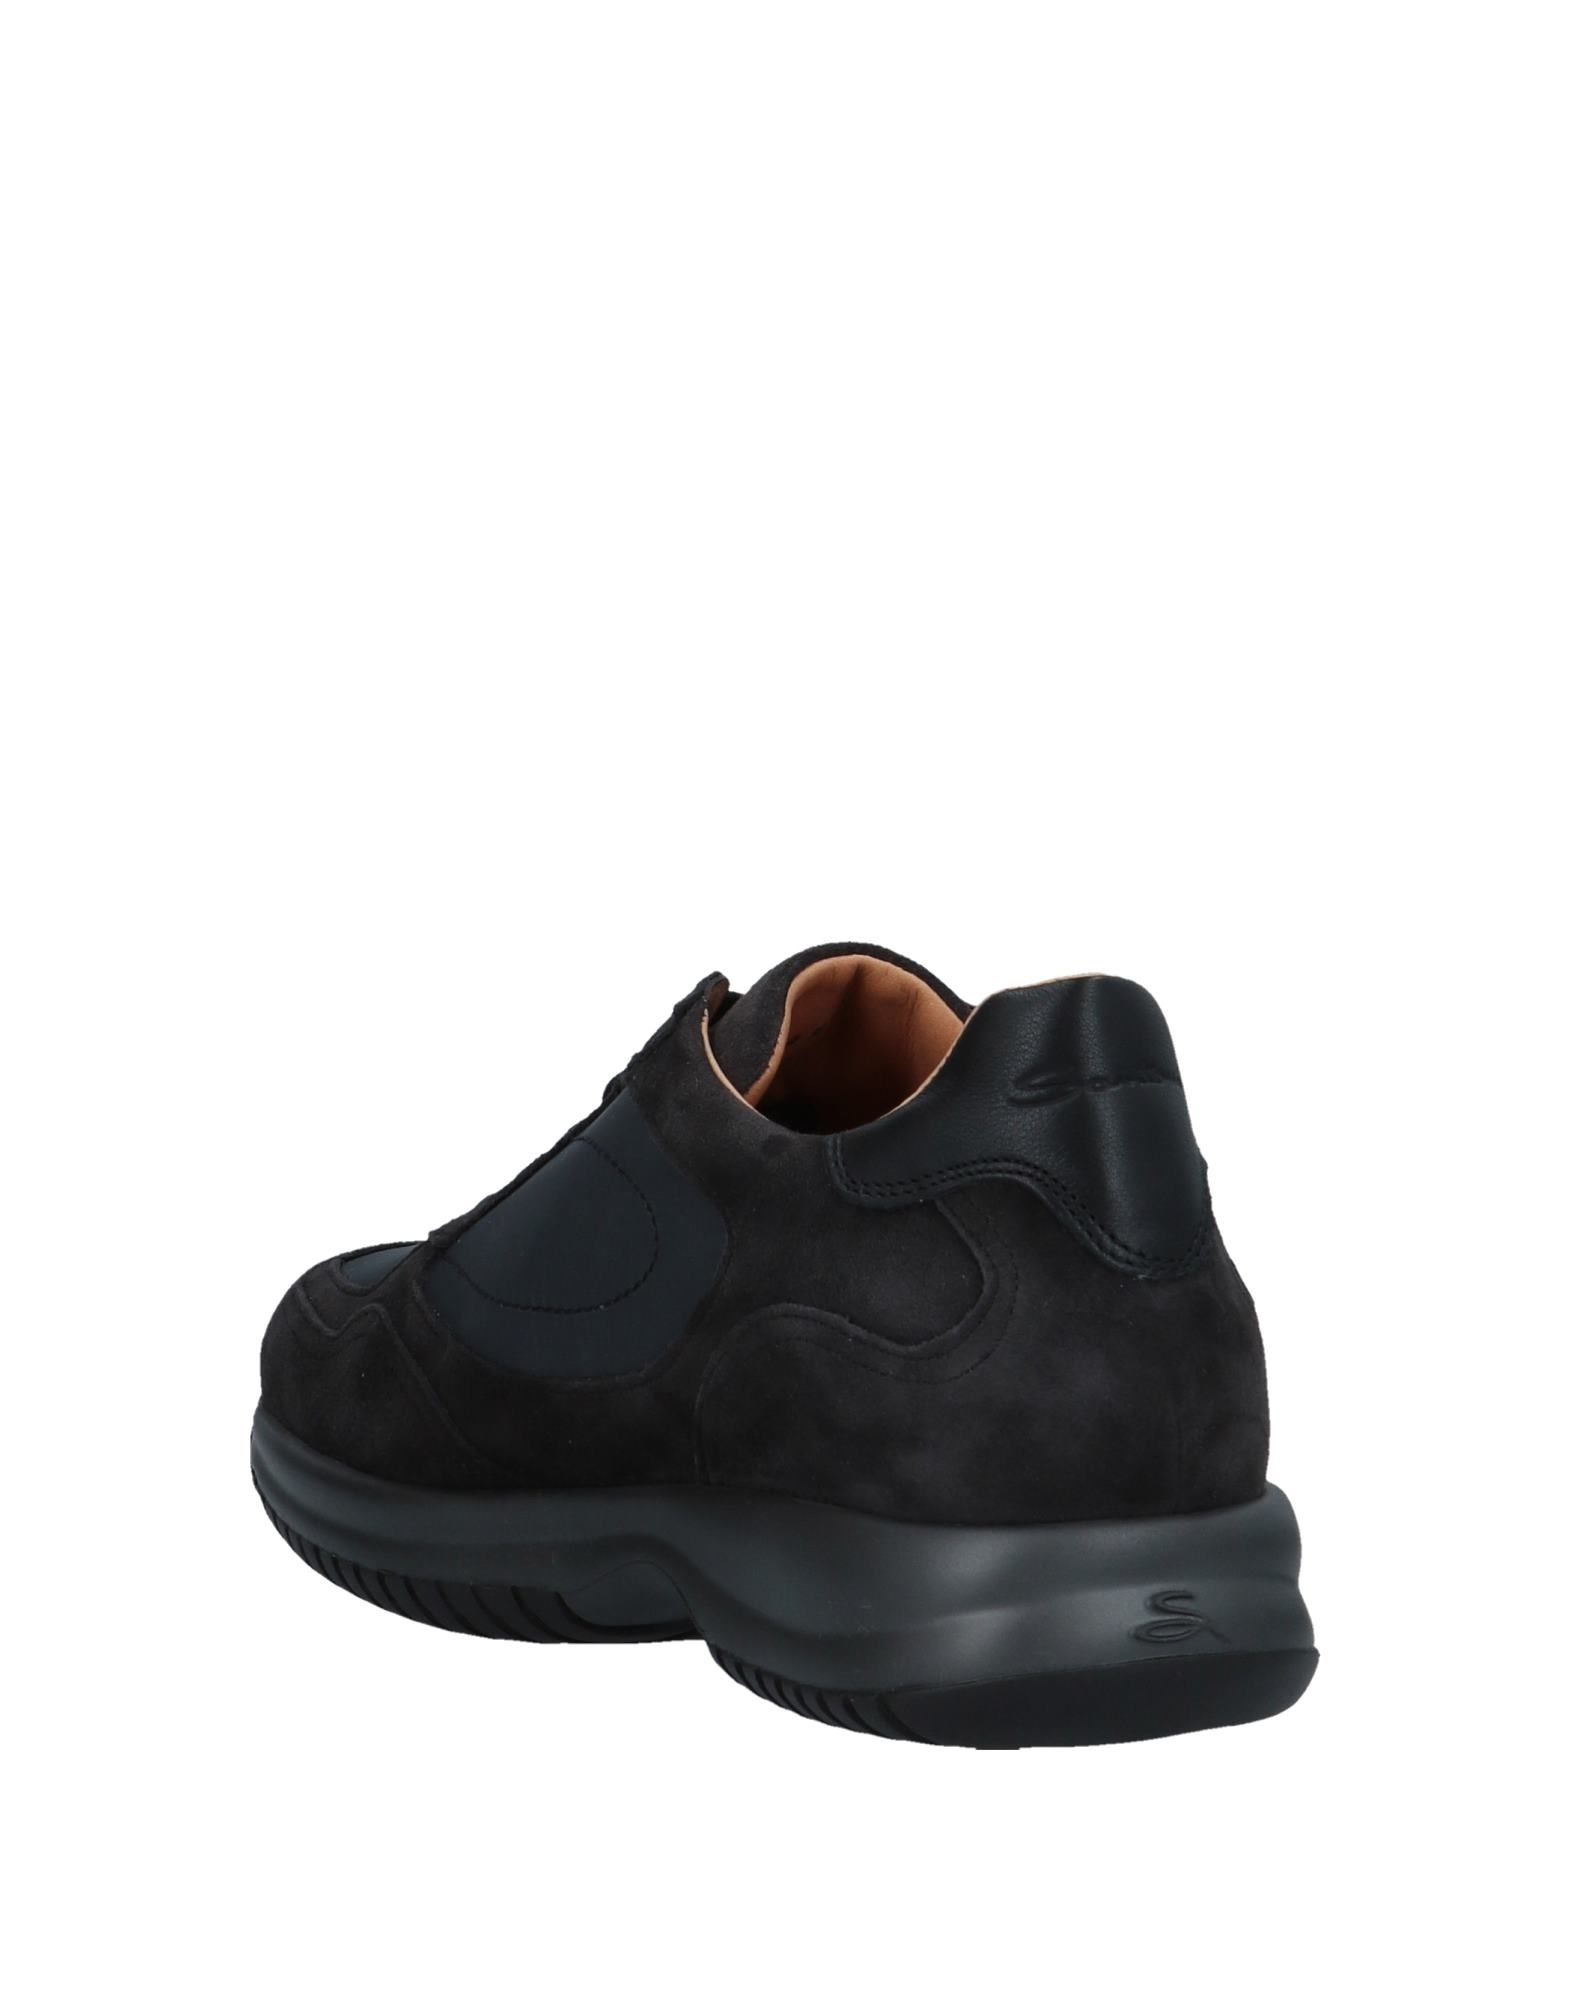 Santoni Sneakers Schuhe Herren  11541347AV Heiße Schuhe Sneakers 158d49